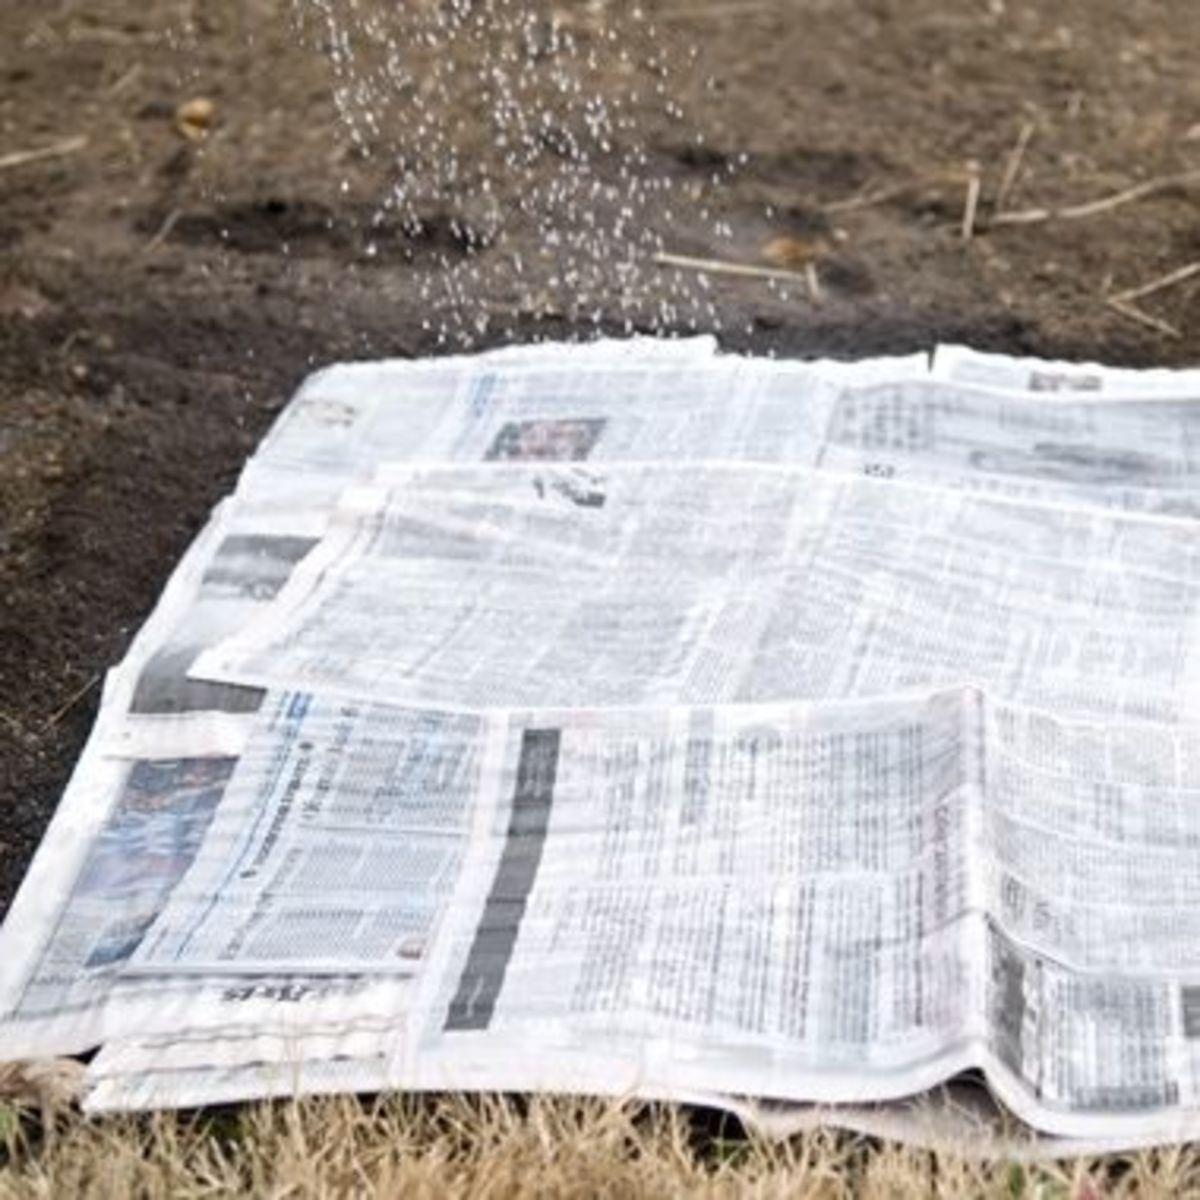 Start With Newspaper Or Cardboard